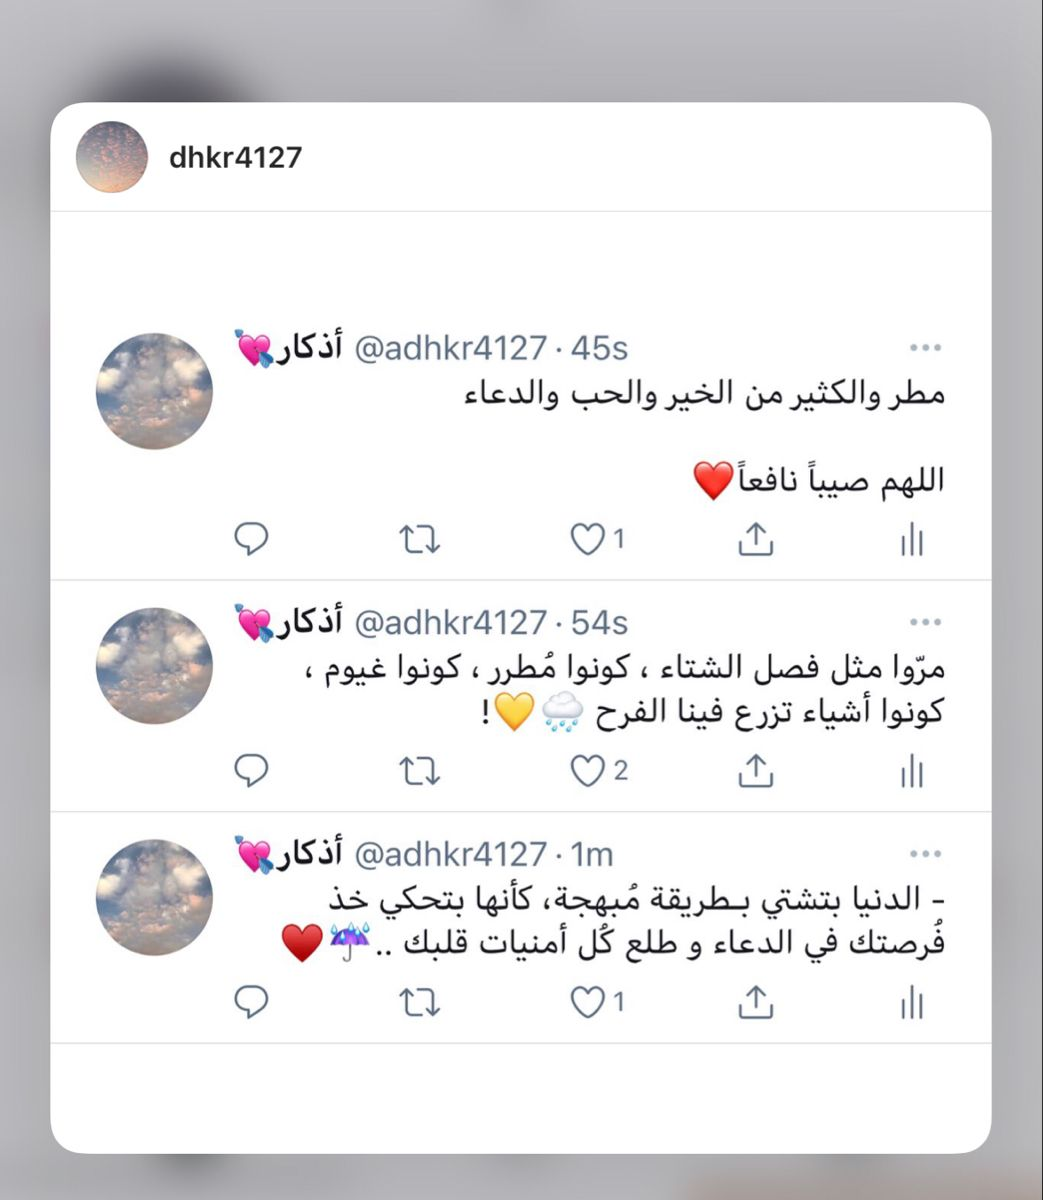 أذكار Adhkr4127 Twitter In 2021 My Pictures Make It Yourself Twitter Sign Up